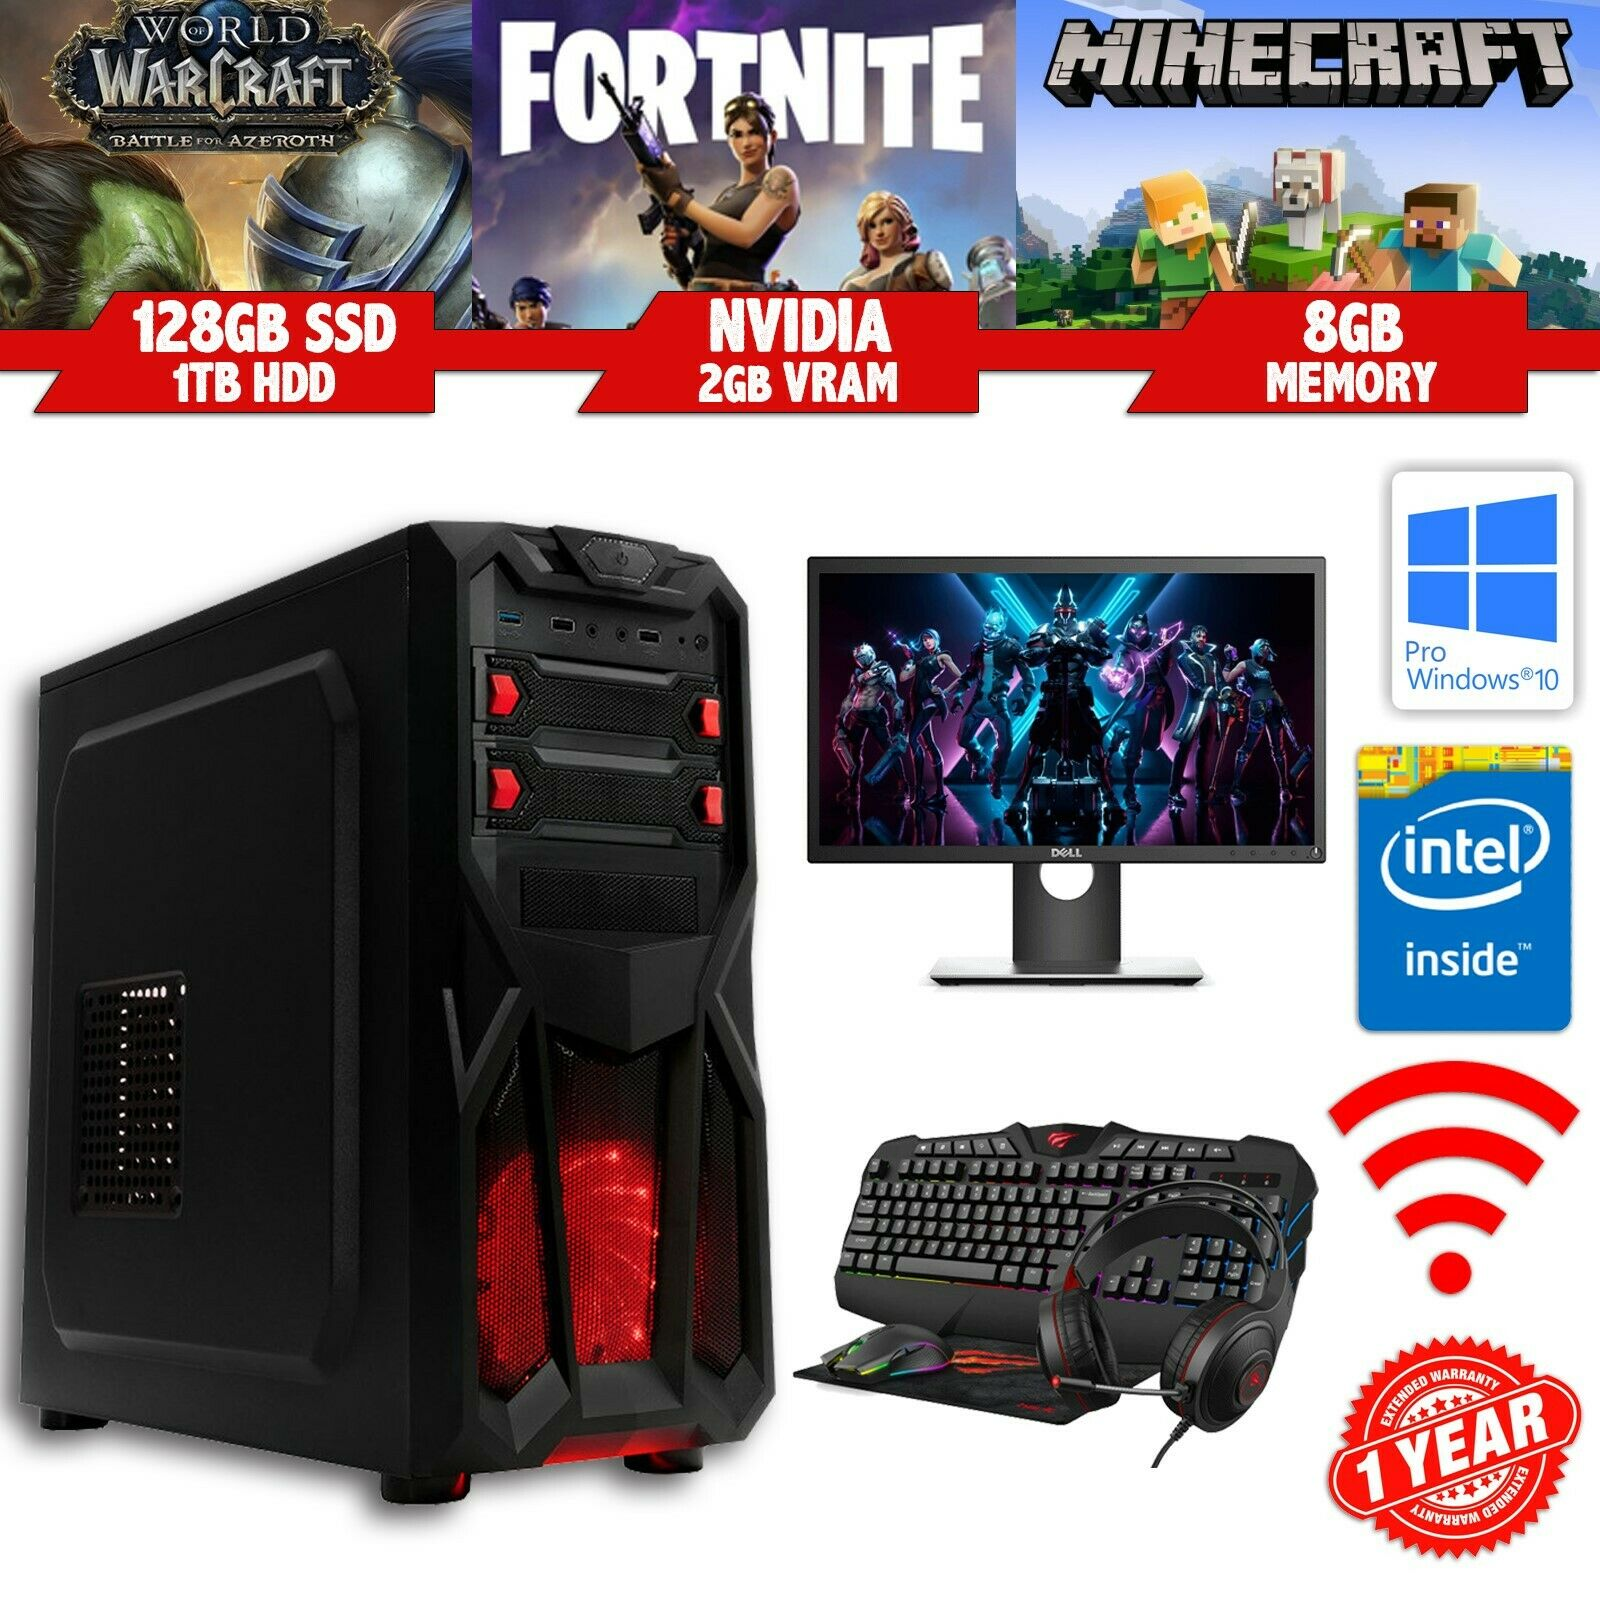 Cheap FORTNITE Gaming PC Bundle - Intel i7 - 8GB - SSD ...